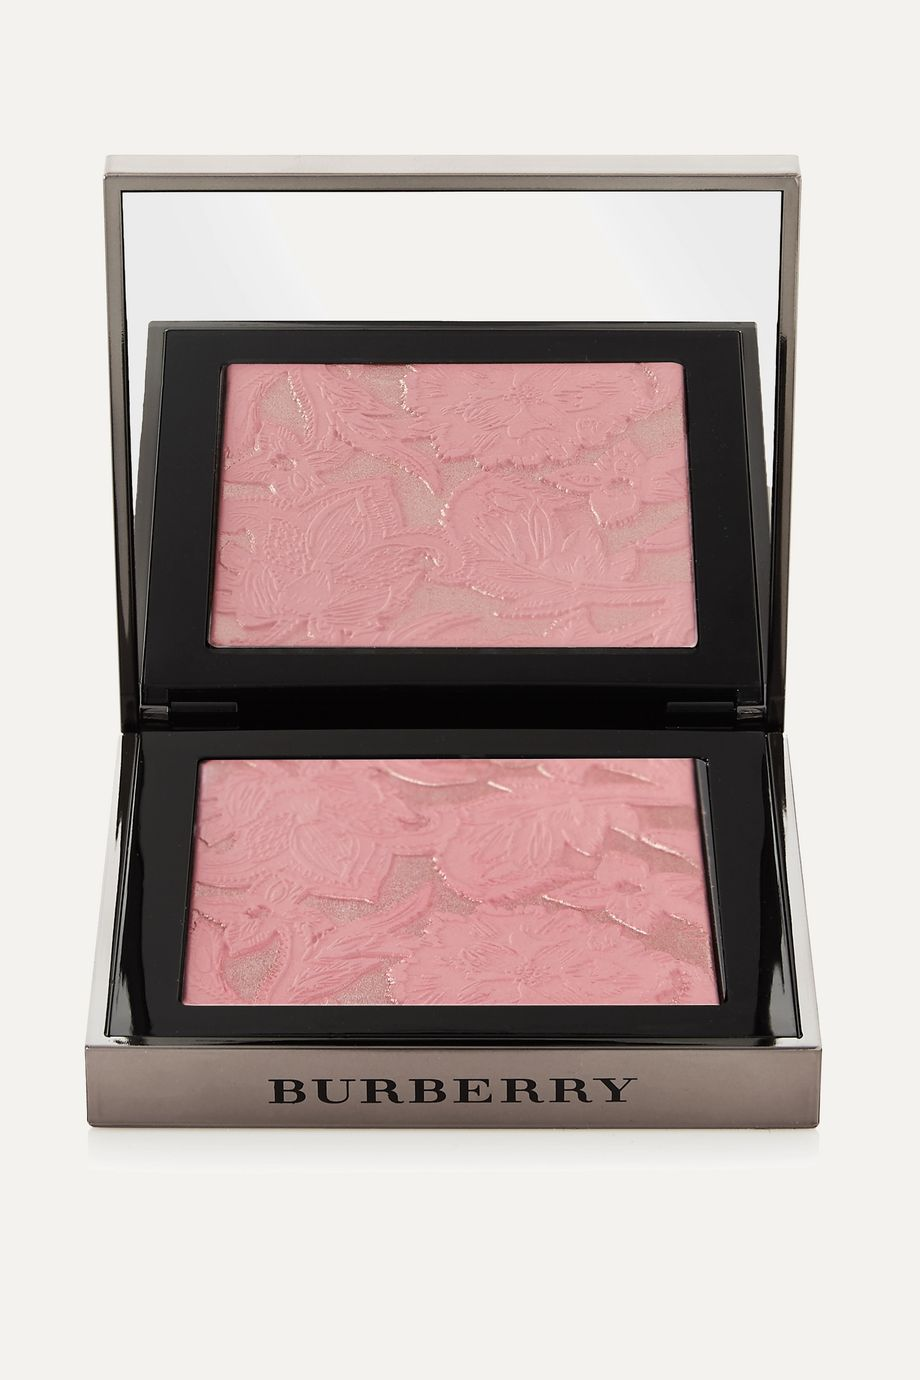 Burberry Beauty My Burberry Blush Palette